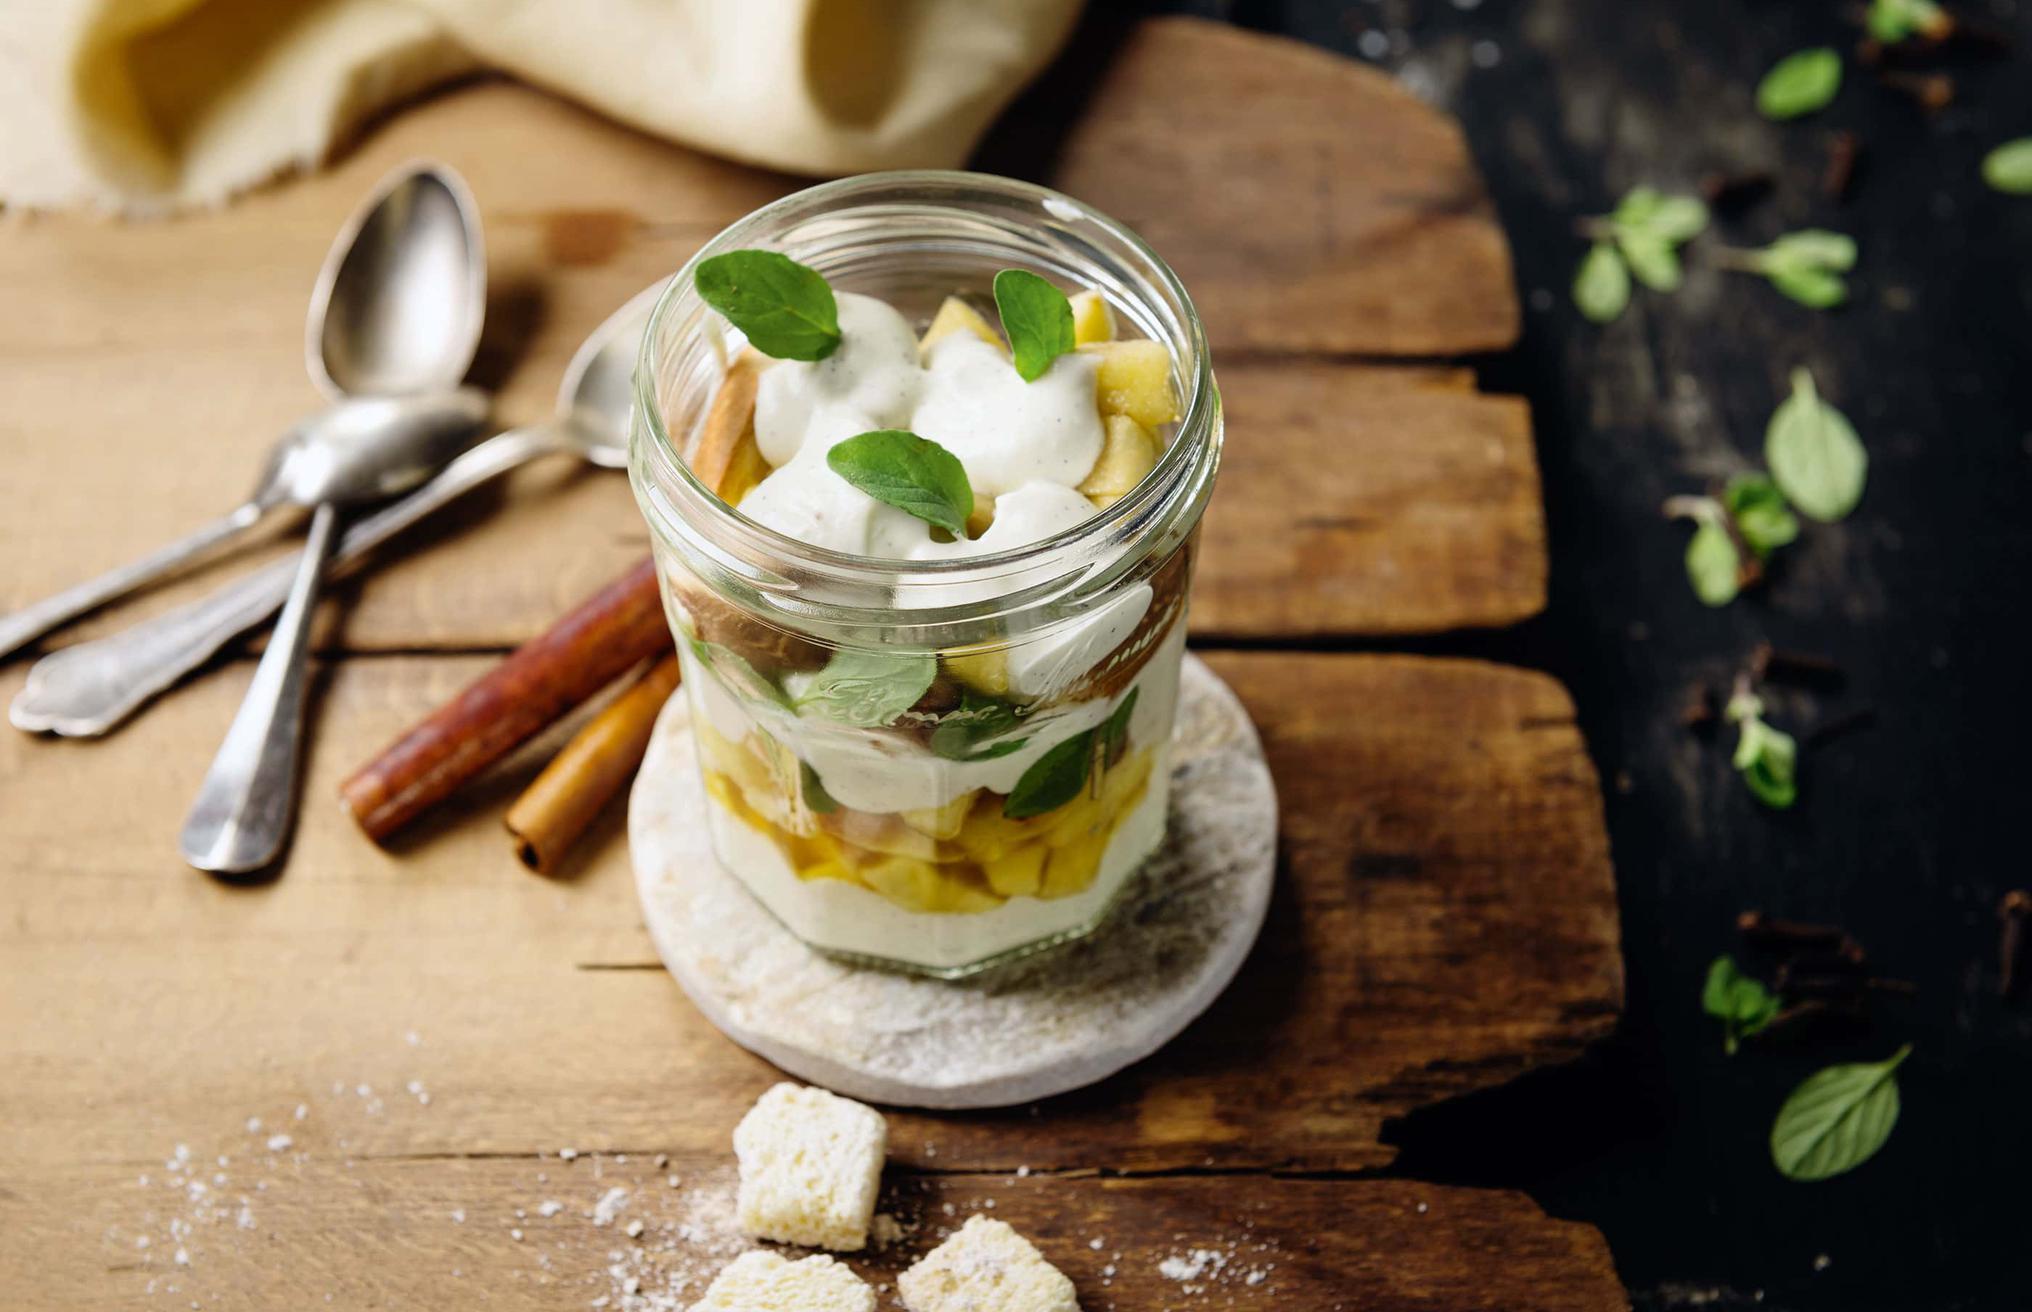 Apfel-Joghurt-Dessert im Glas